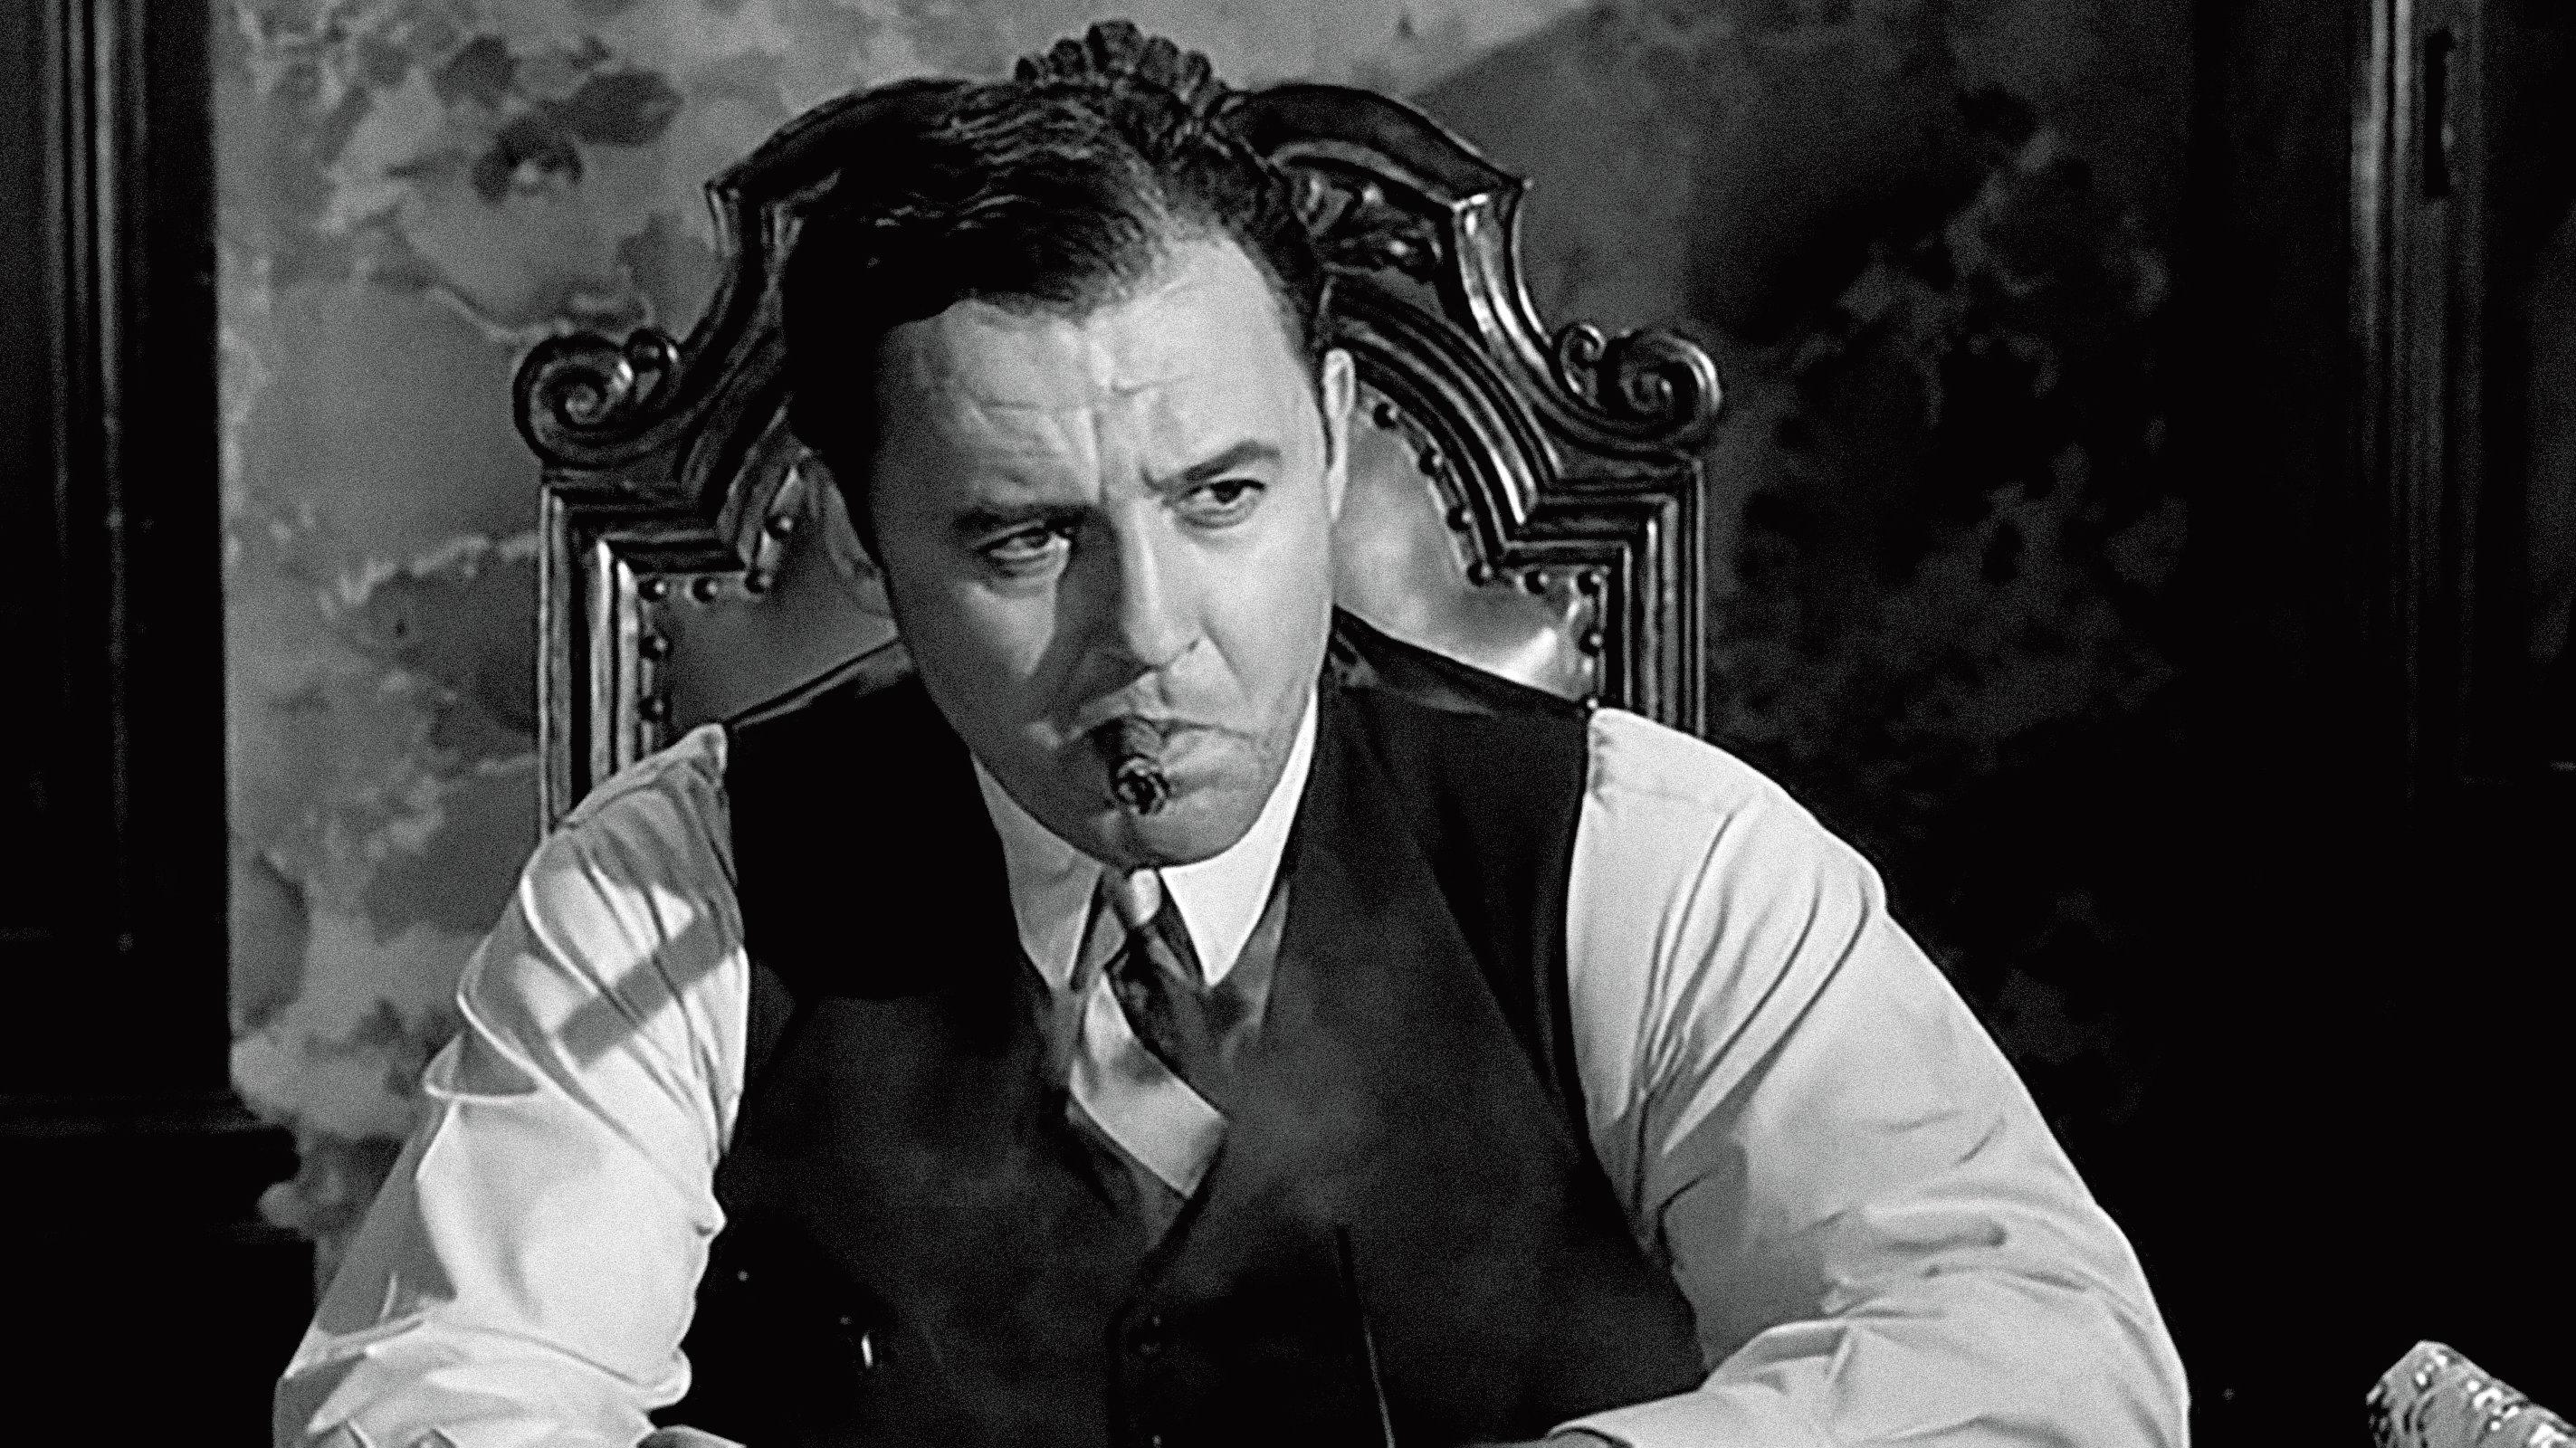 Rod Steiger interpretando Al Capone